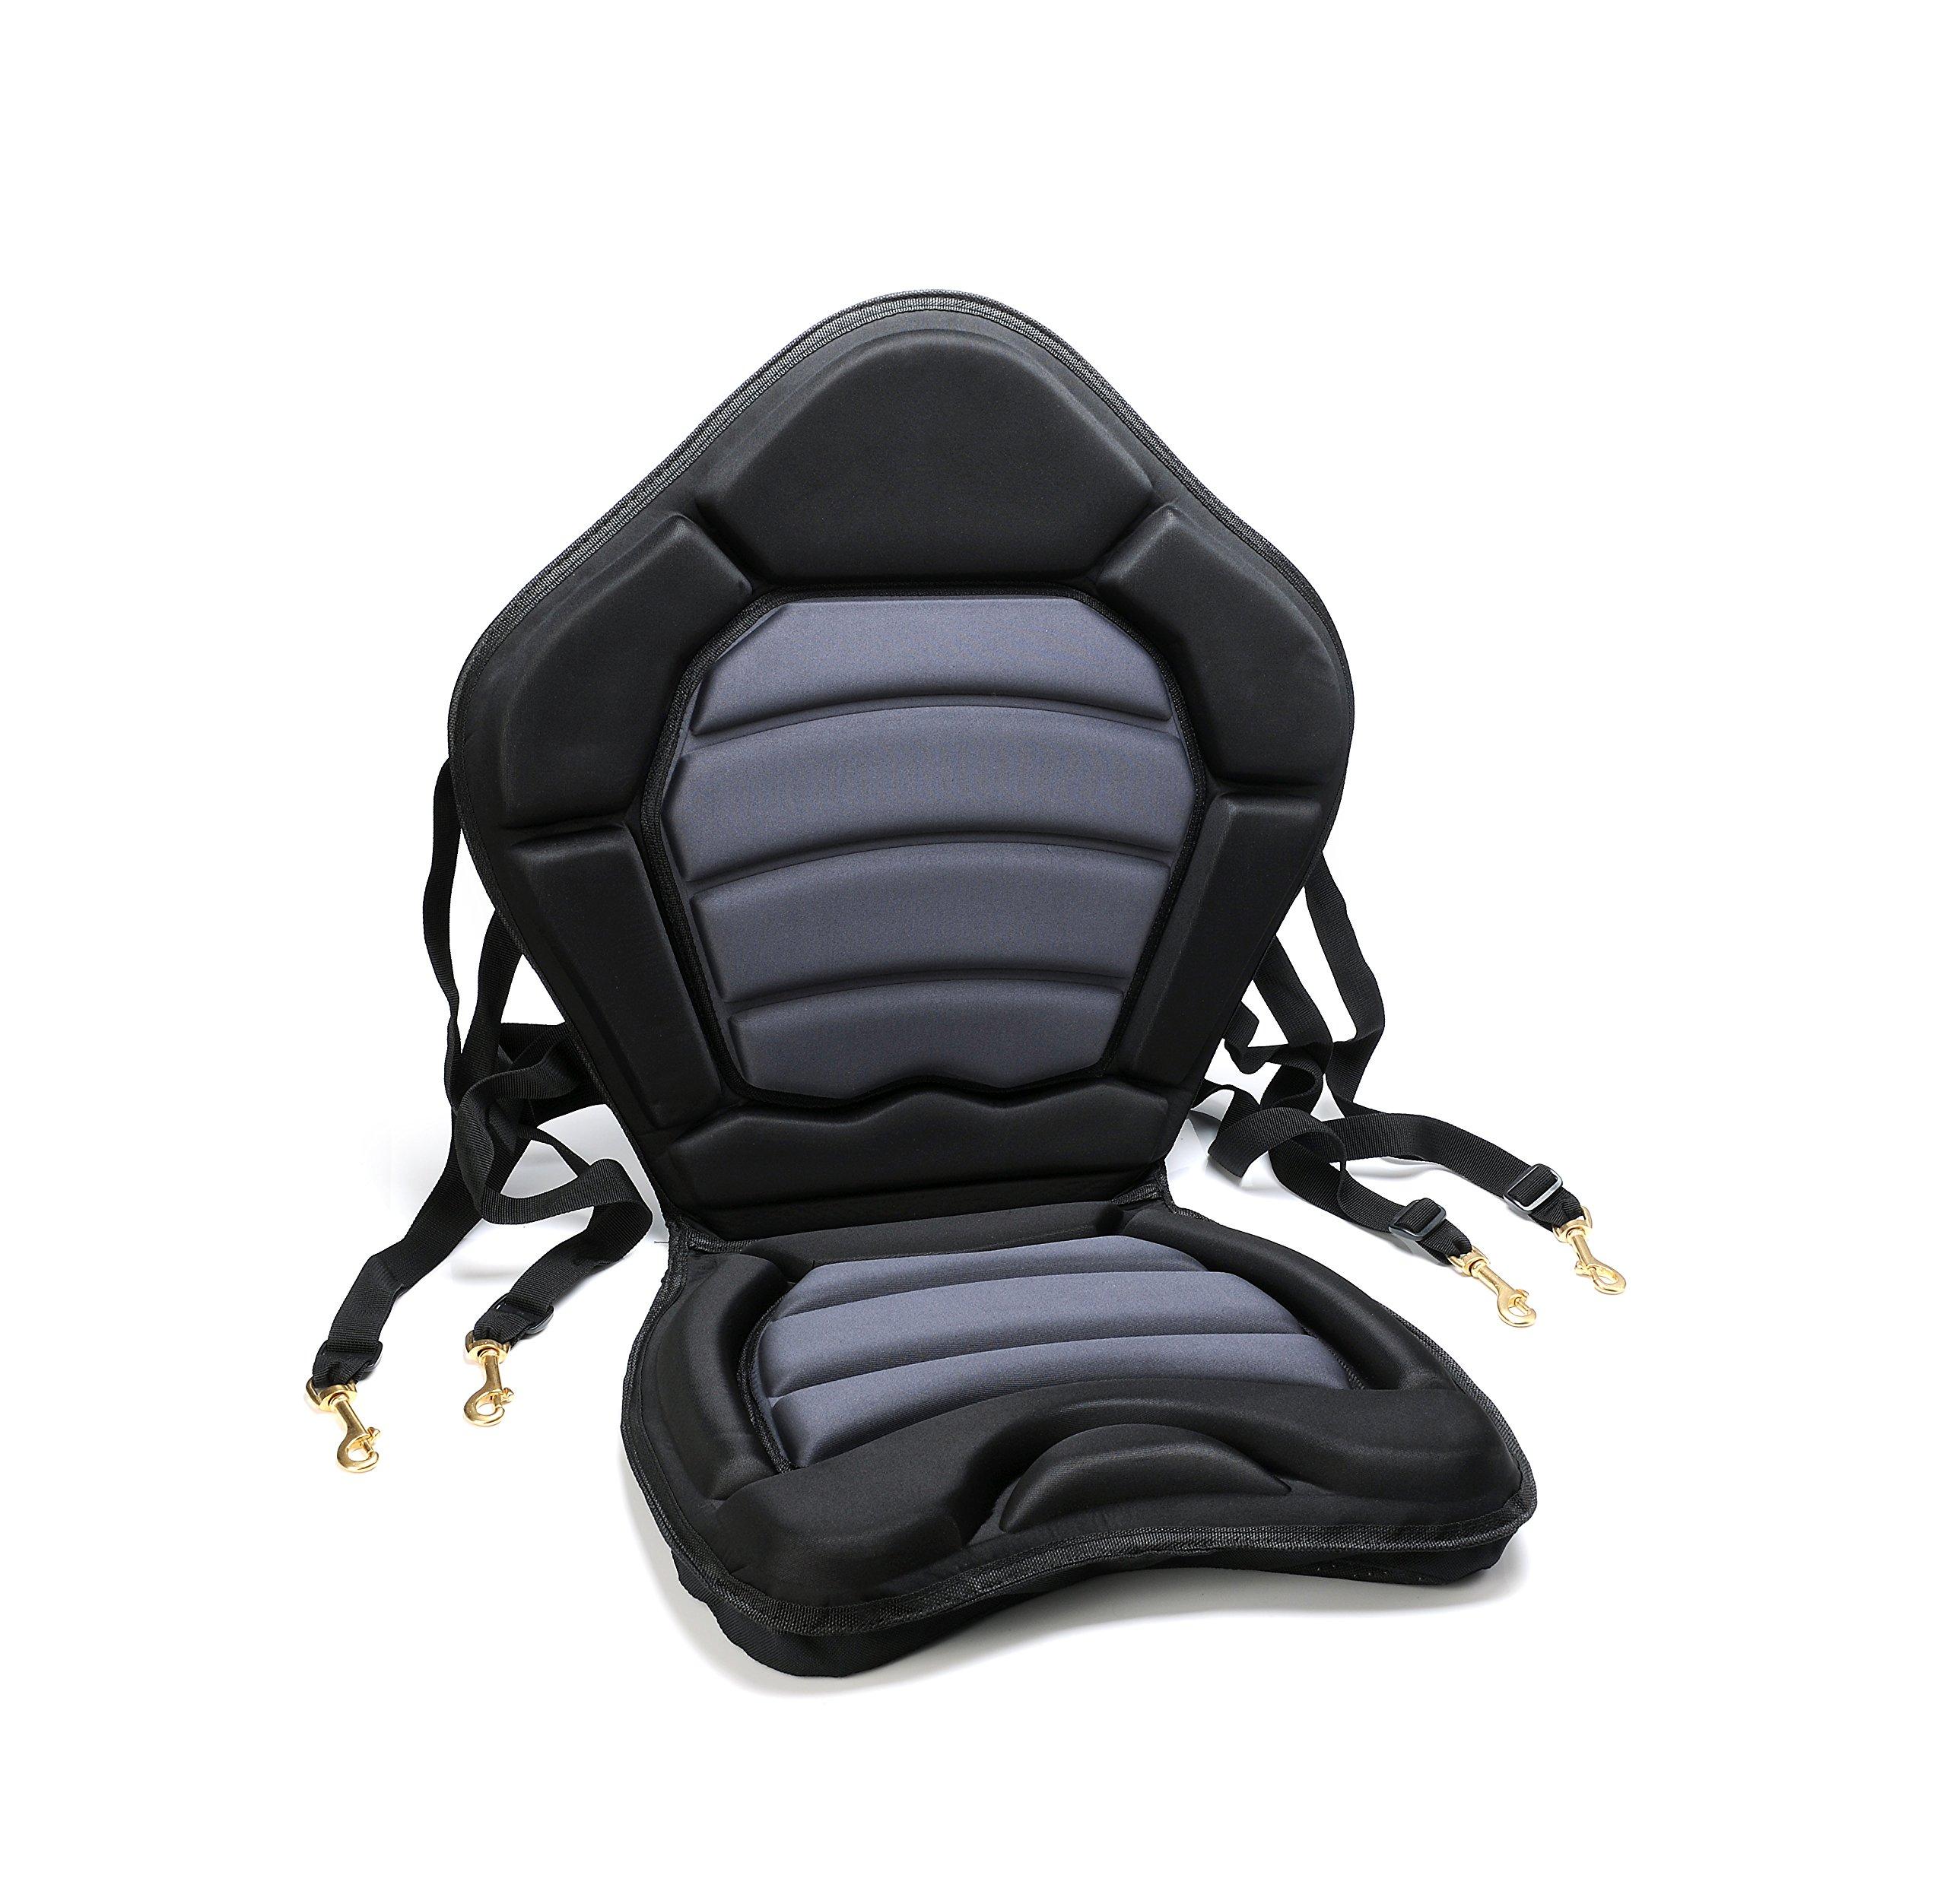 OceanMotion Ergo-Fit sit on top Kayak seat by OceanMotion (Image #1)